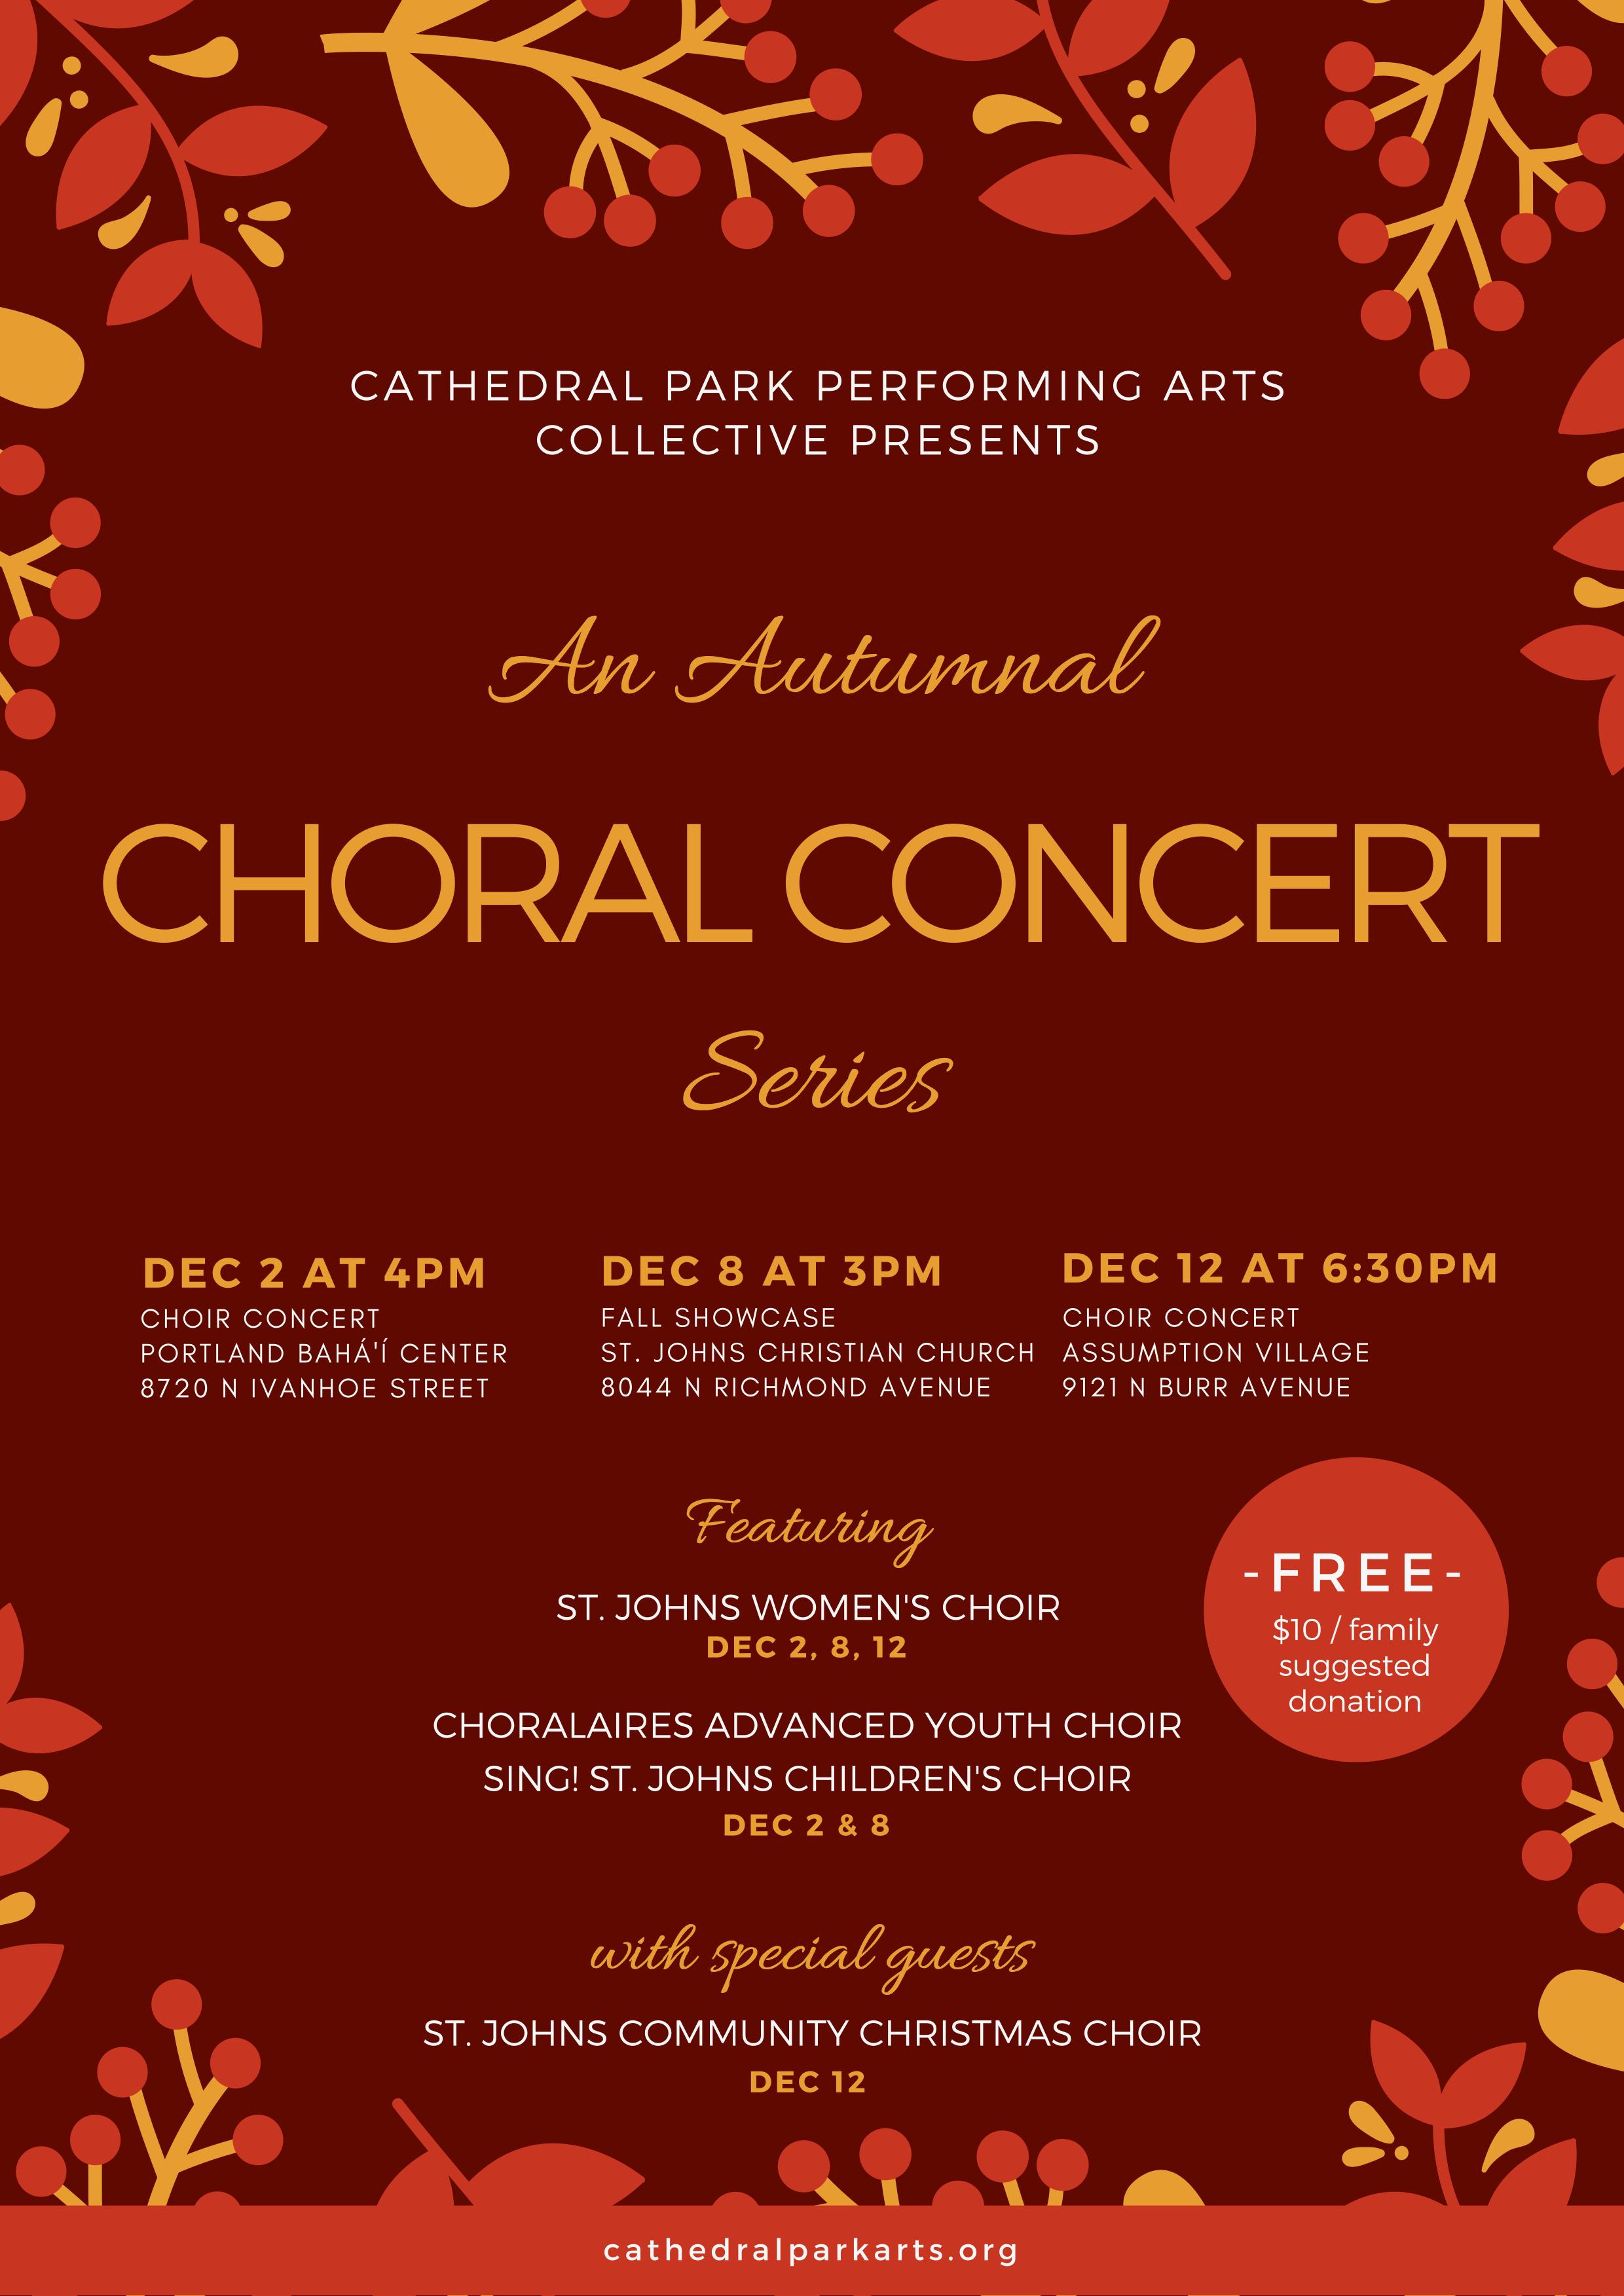 Choral Concert Series | December 2, 8, 12